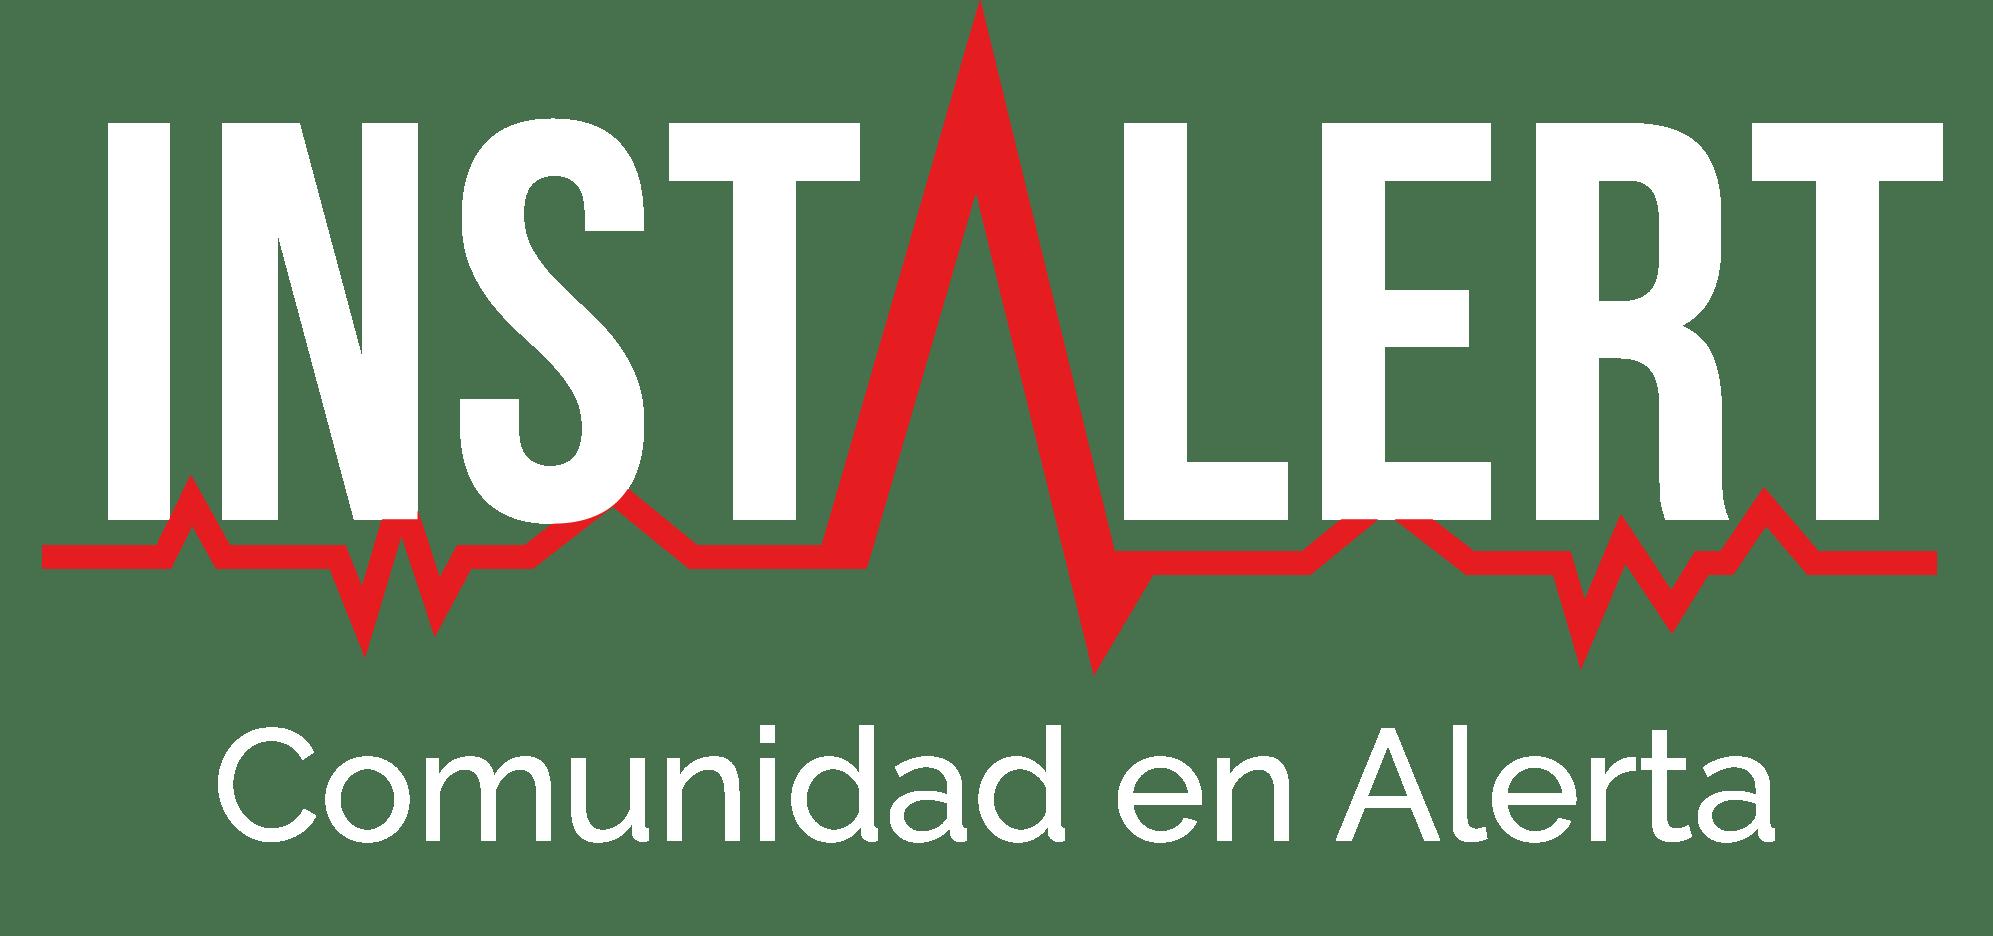 Proyecto App Instalert Araucania